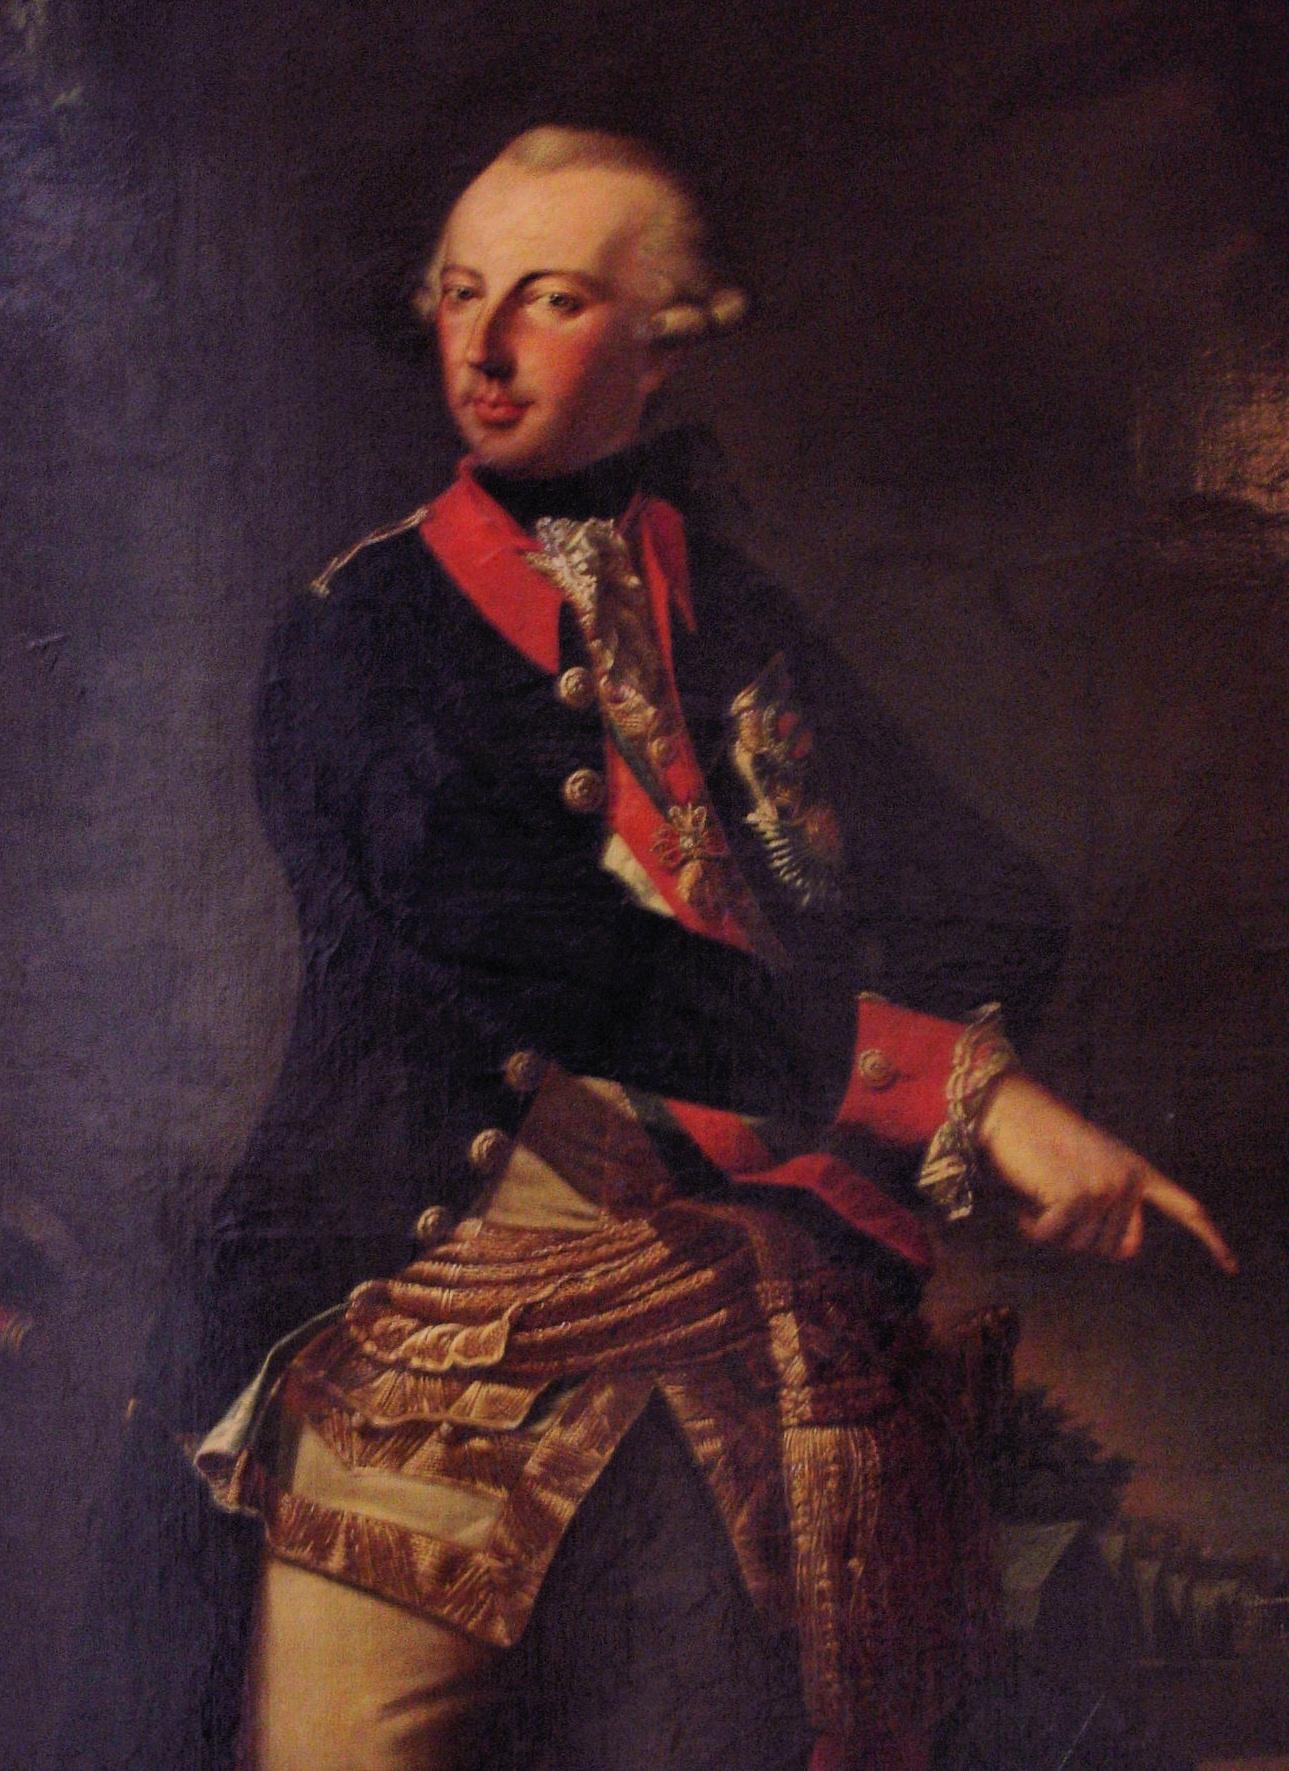 Plik:Joseph II, Holy Roman Emperor.jpg – Wikipedia, wolna encyklopedia